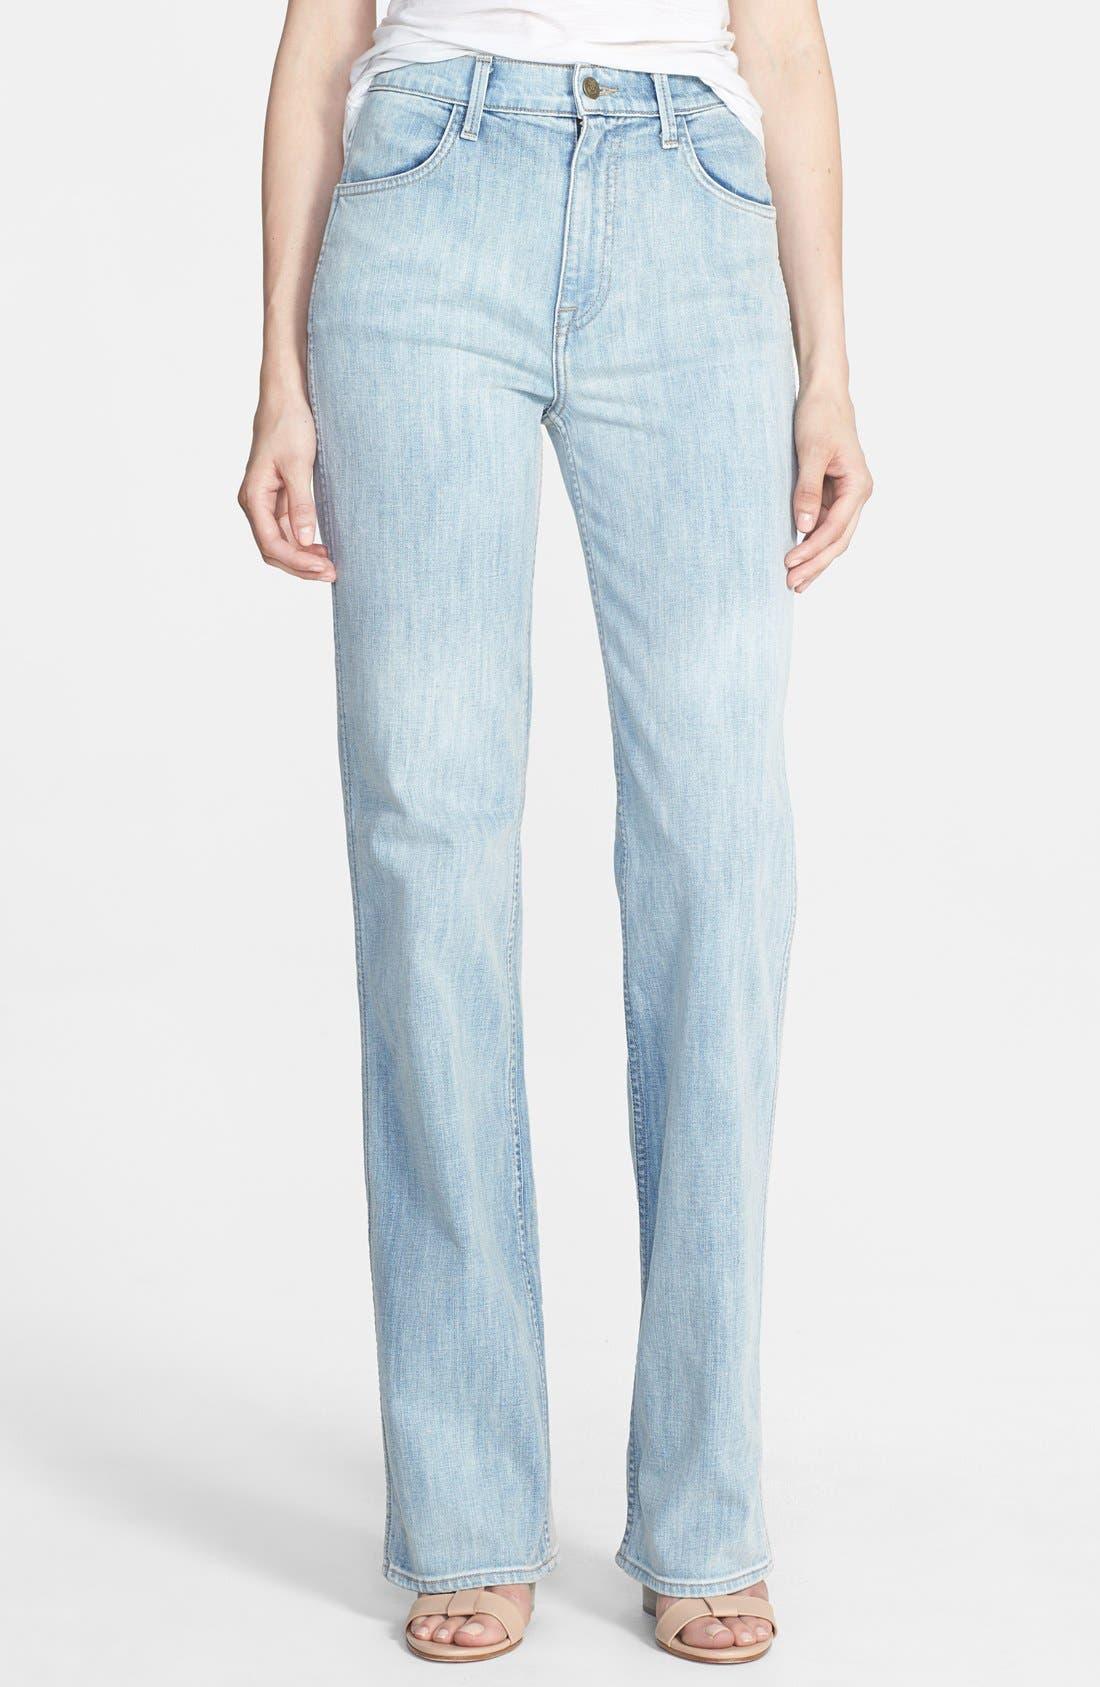 Main Image - Wildfox 'Luca' High Rise Straight Leg Jeans (Faithful)